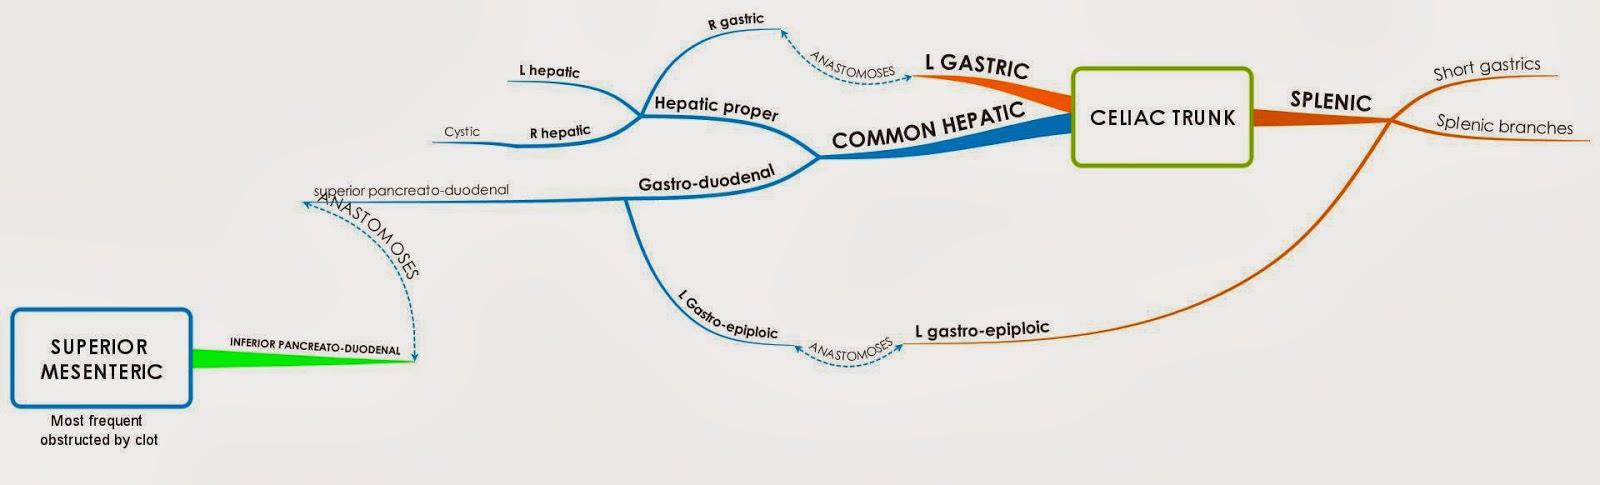 celiac trunk model- #images, Cephalic Vein